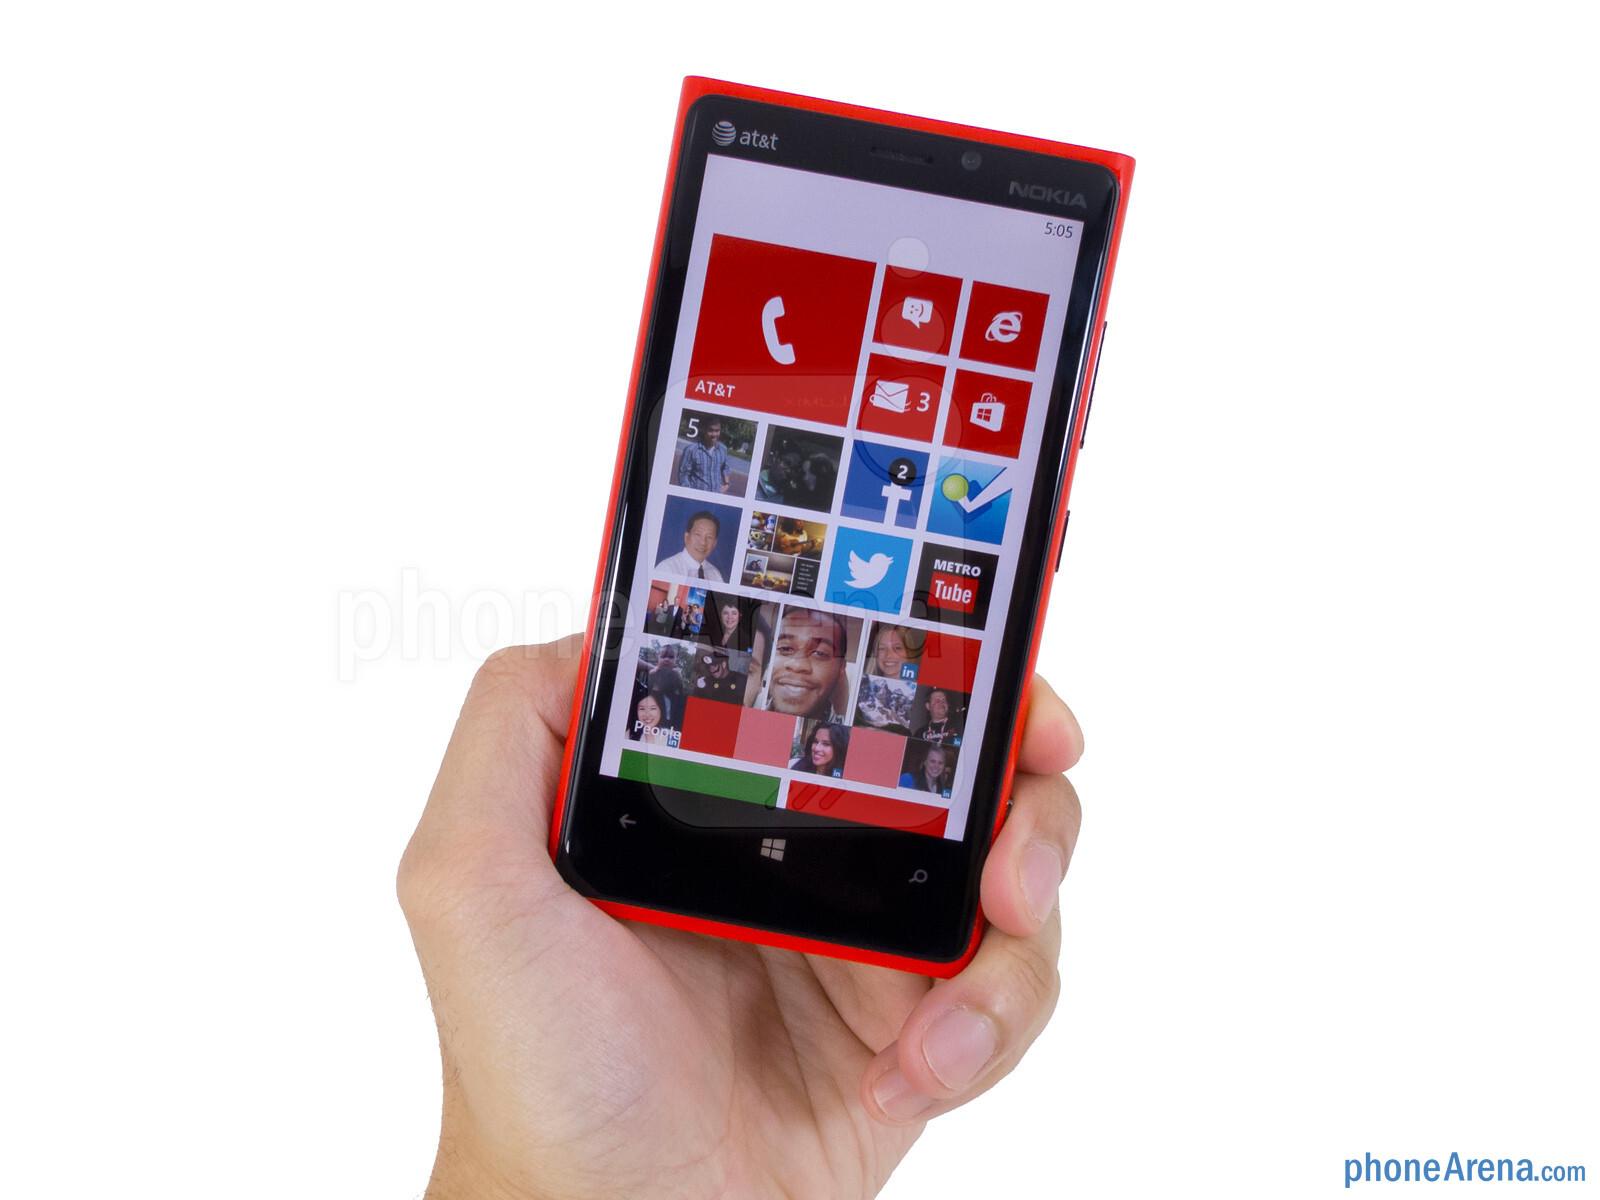 Xperia Z Vs Galaxy S4 Vs Iphone 5 Nokia Lumia 920 Review